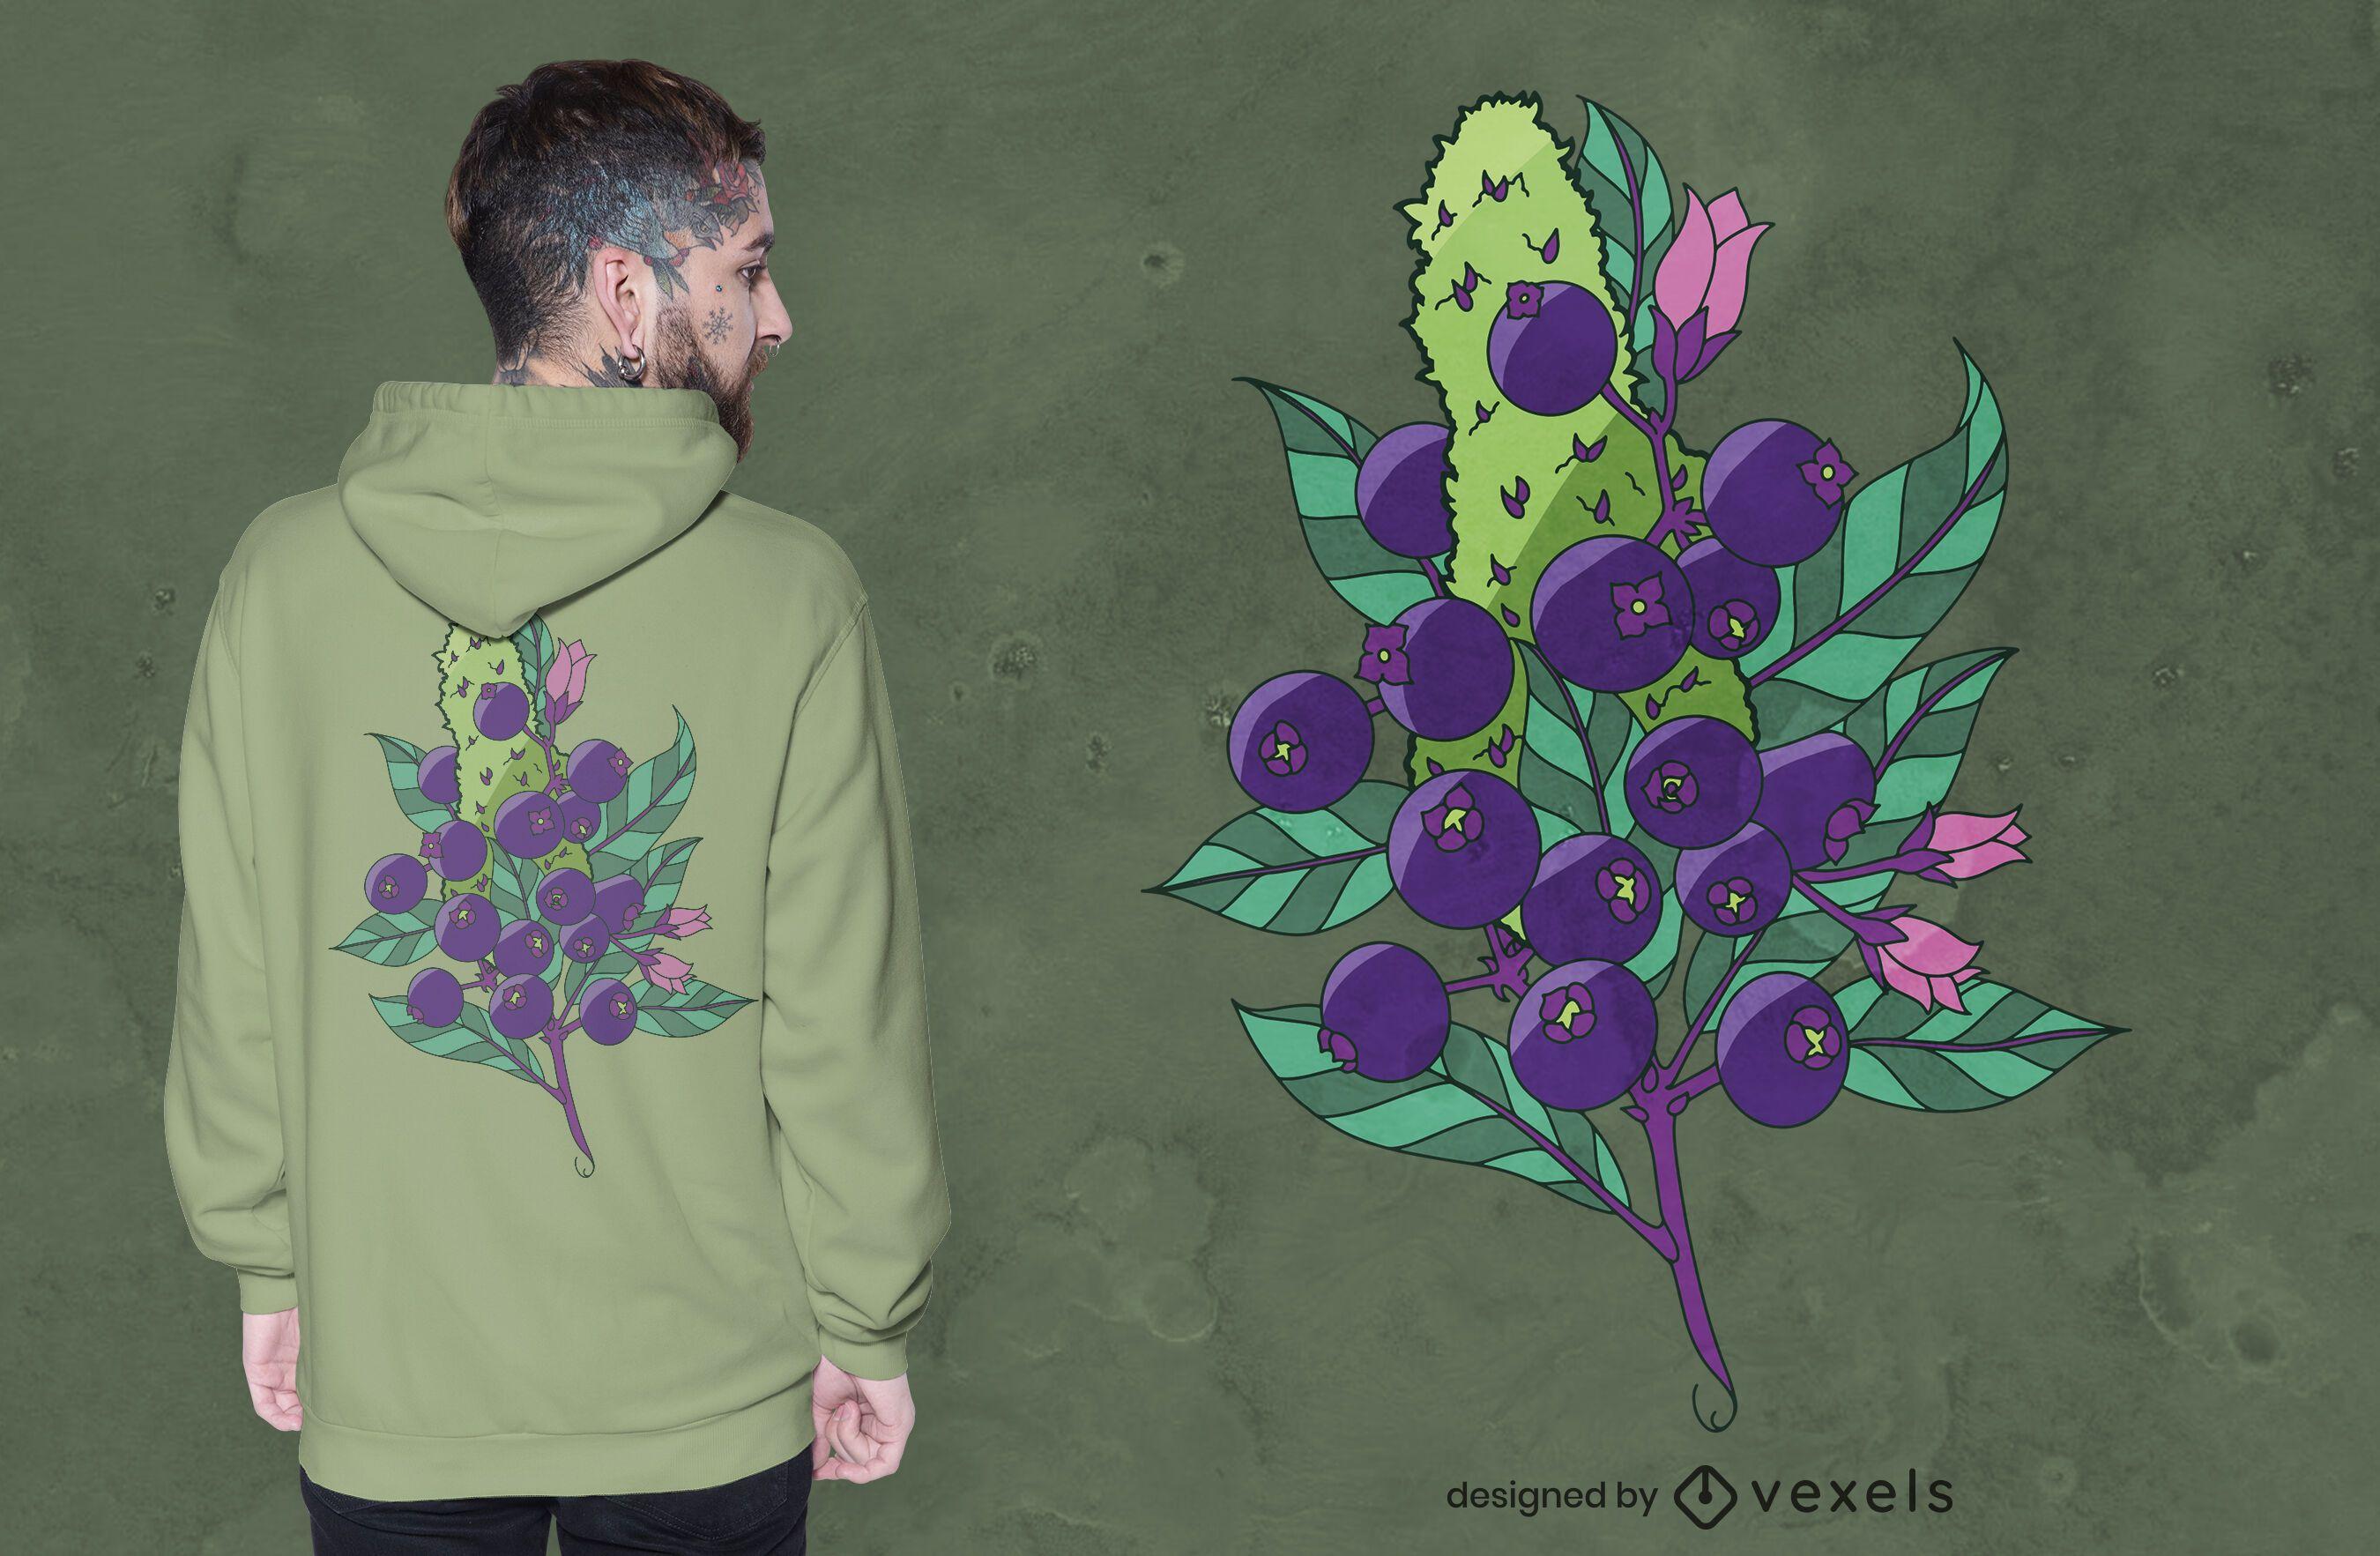 Blueberry kush t-shirt design